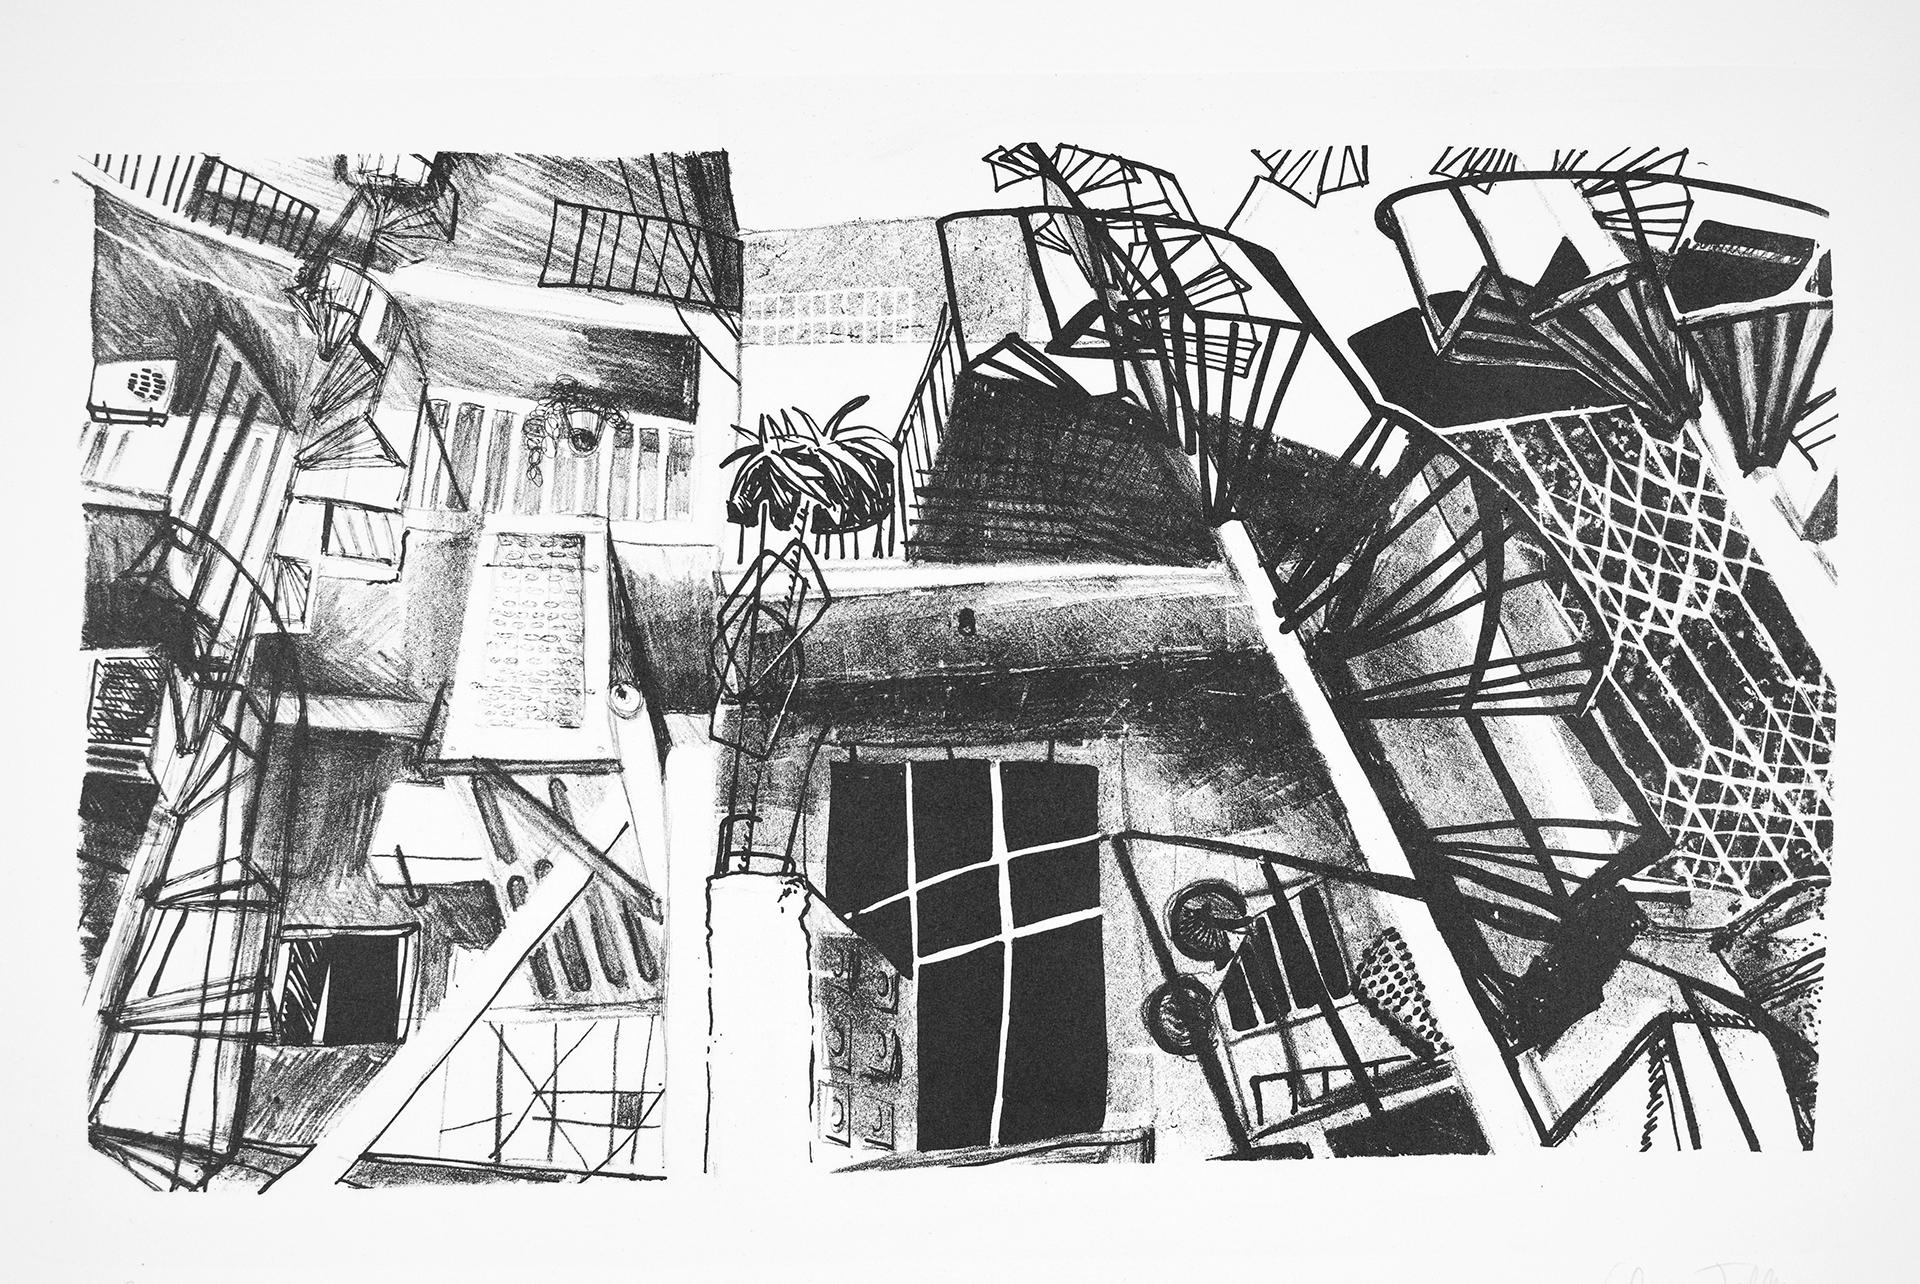 Lithographie, marqueur, crayon, encre, stylo bille, 2015,